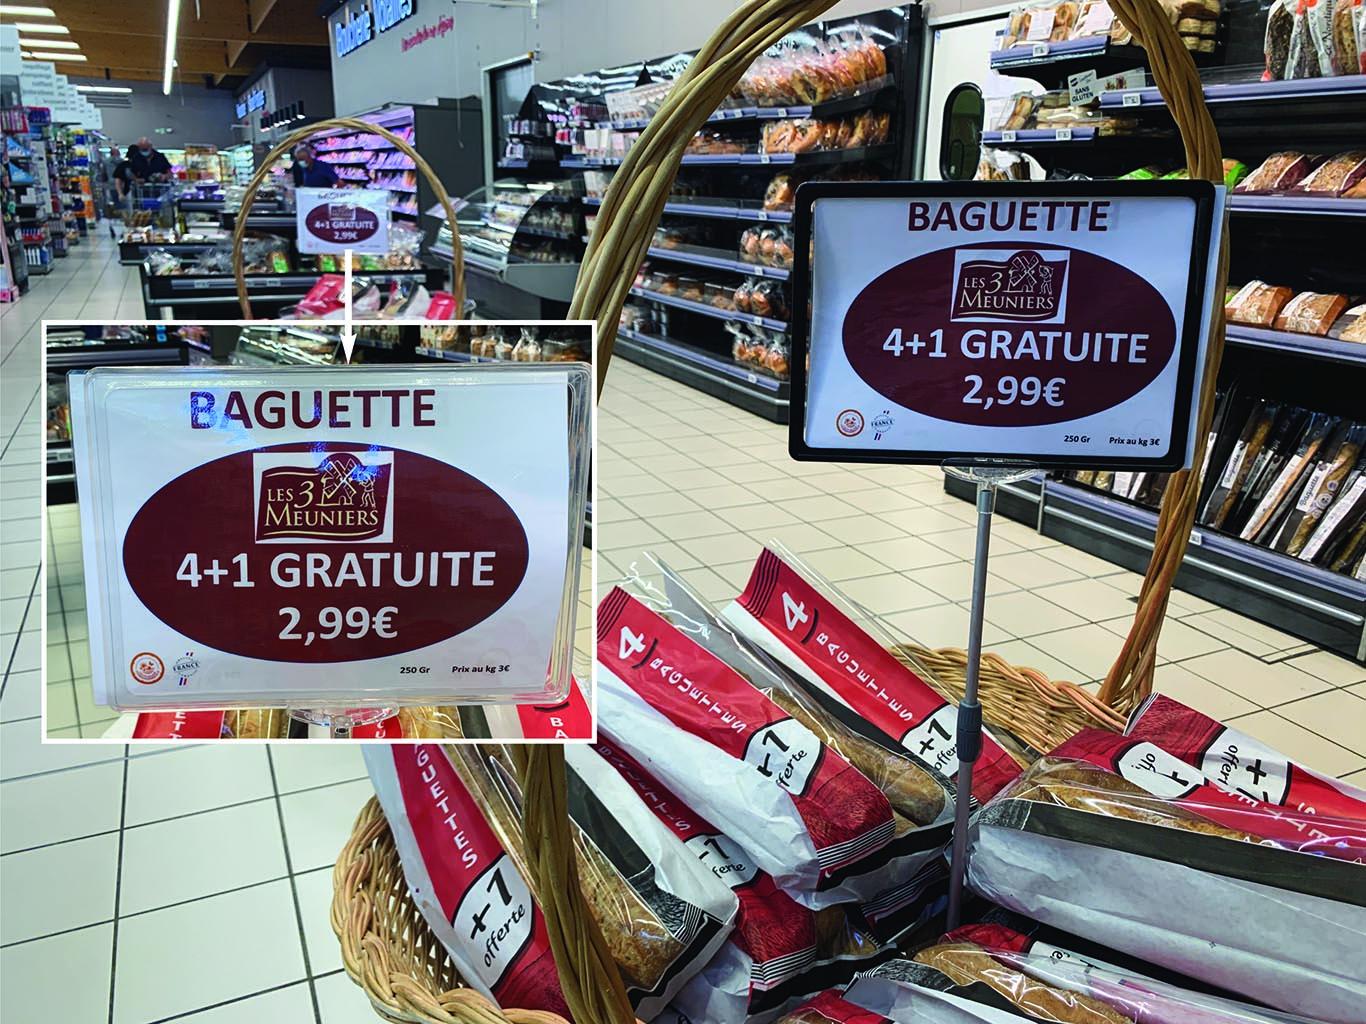 BaguetteGratuite